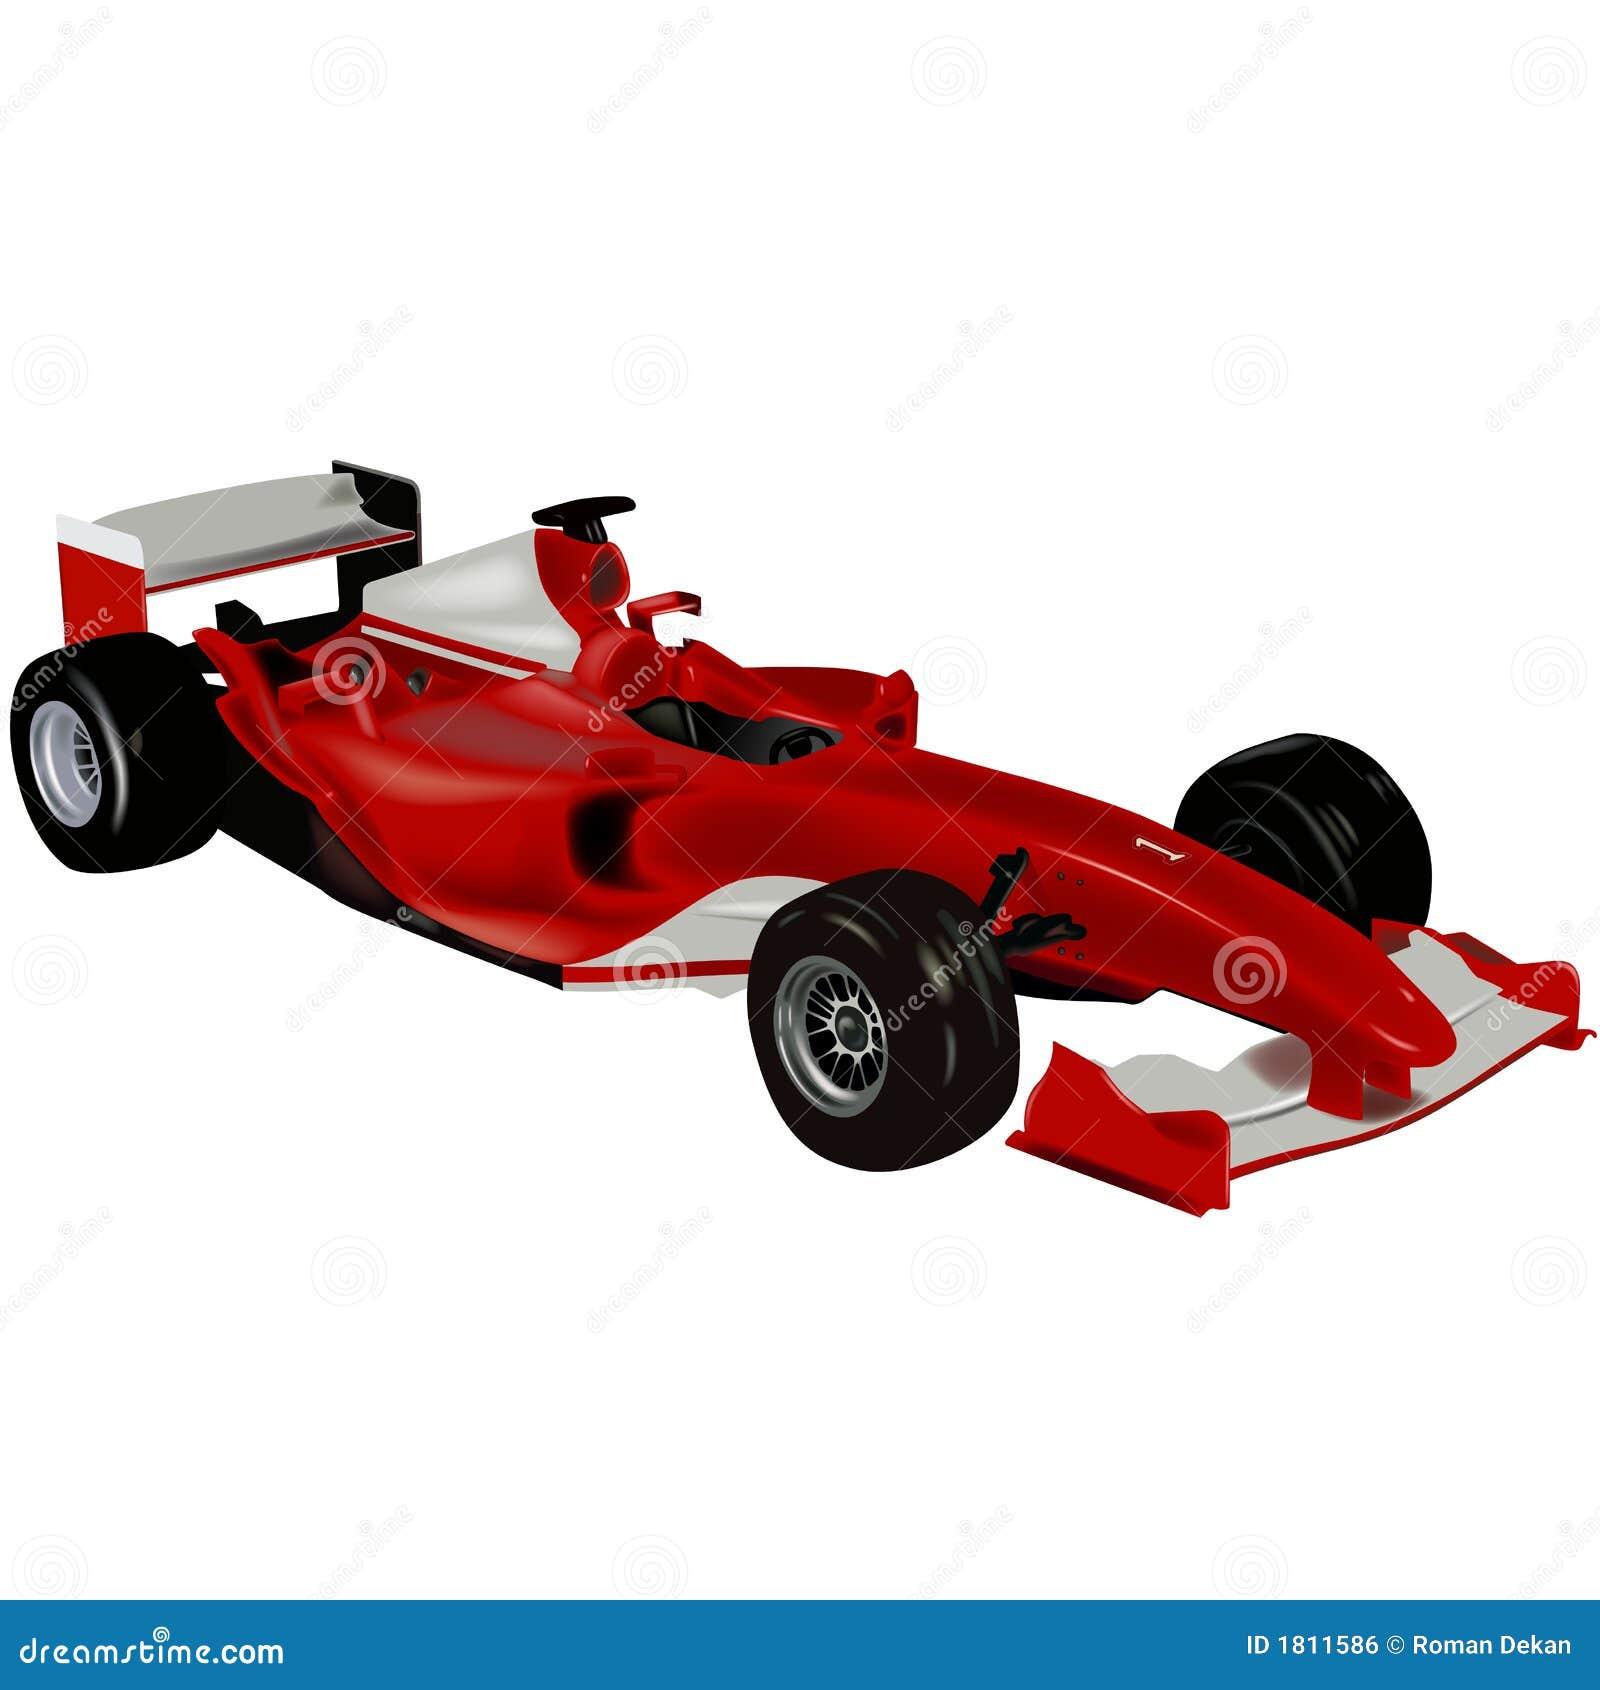 Ferrari F430 Scuderia 2009 3d Model For Download In: F1 Royalty Free Stock Image